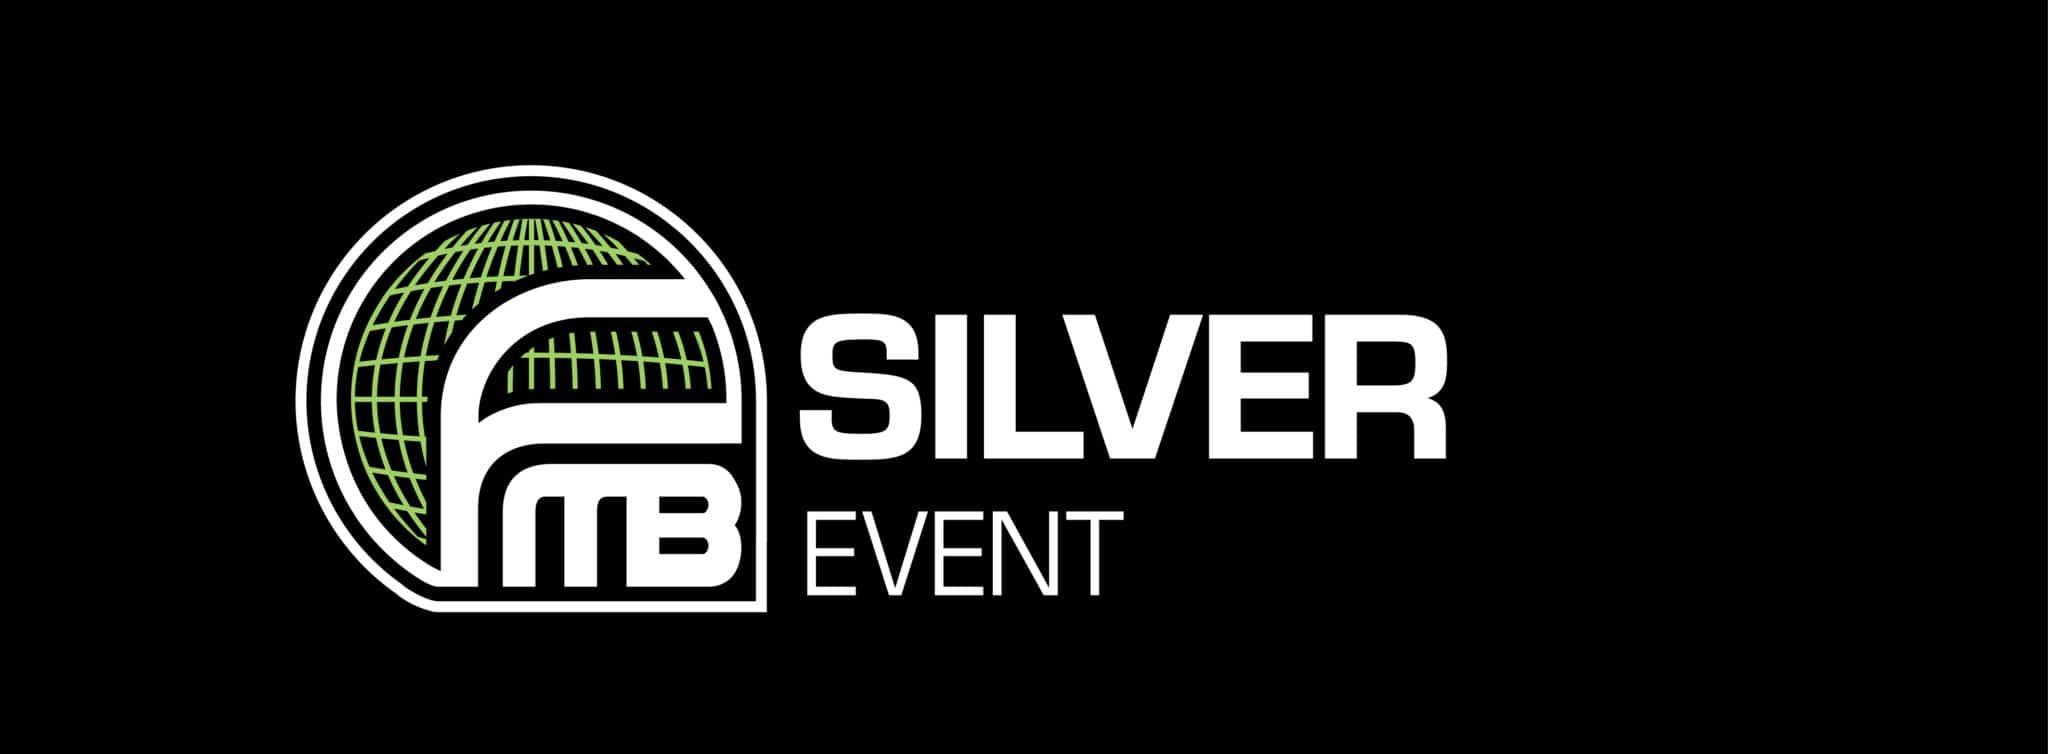 13fmb_event_black_Silver_72dpi[2]